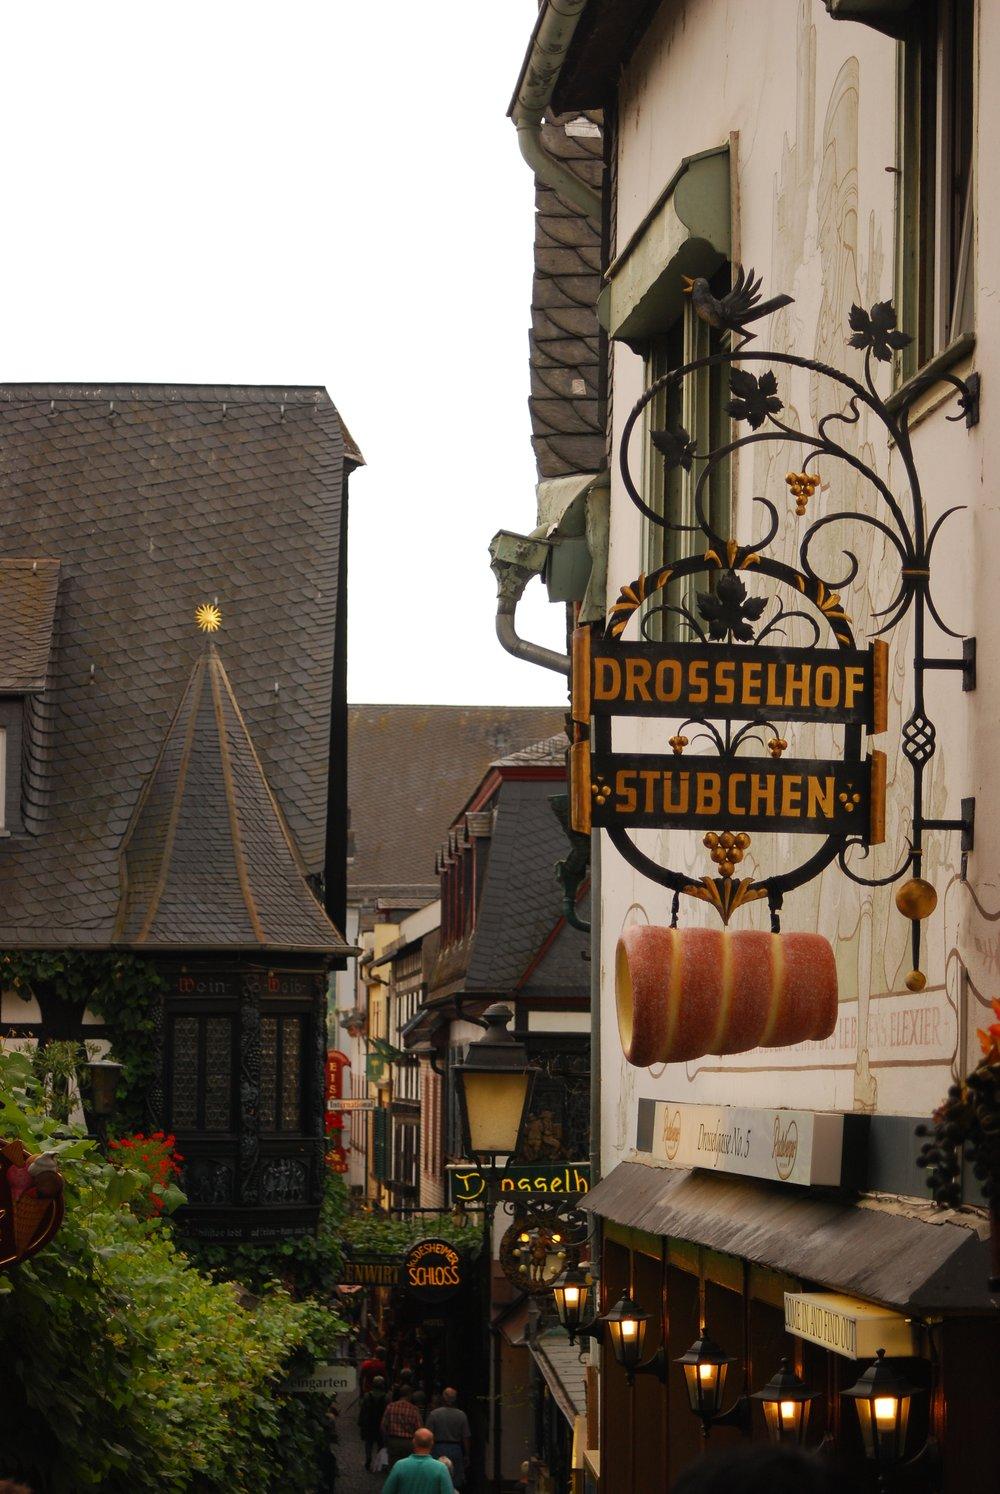 Rudessheim